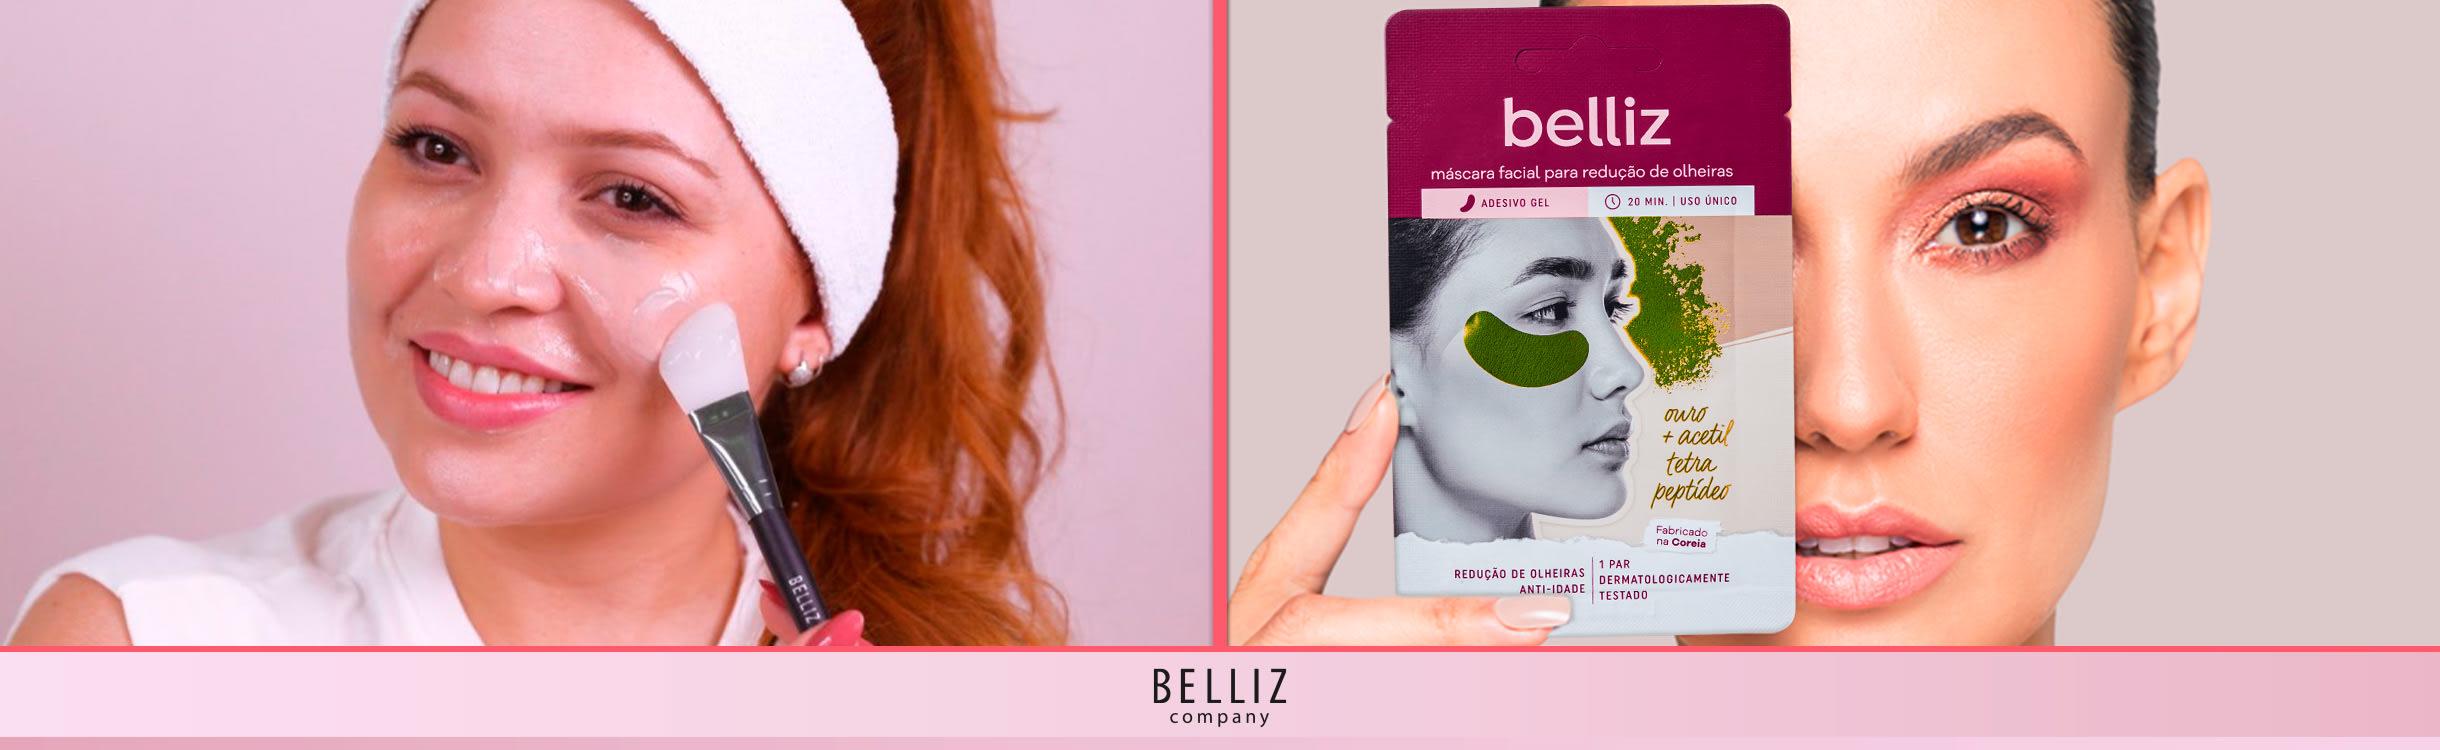 Belliz/Maquiagem/Rosto/Demaquilante